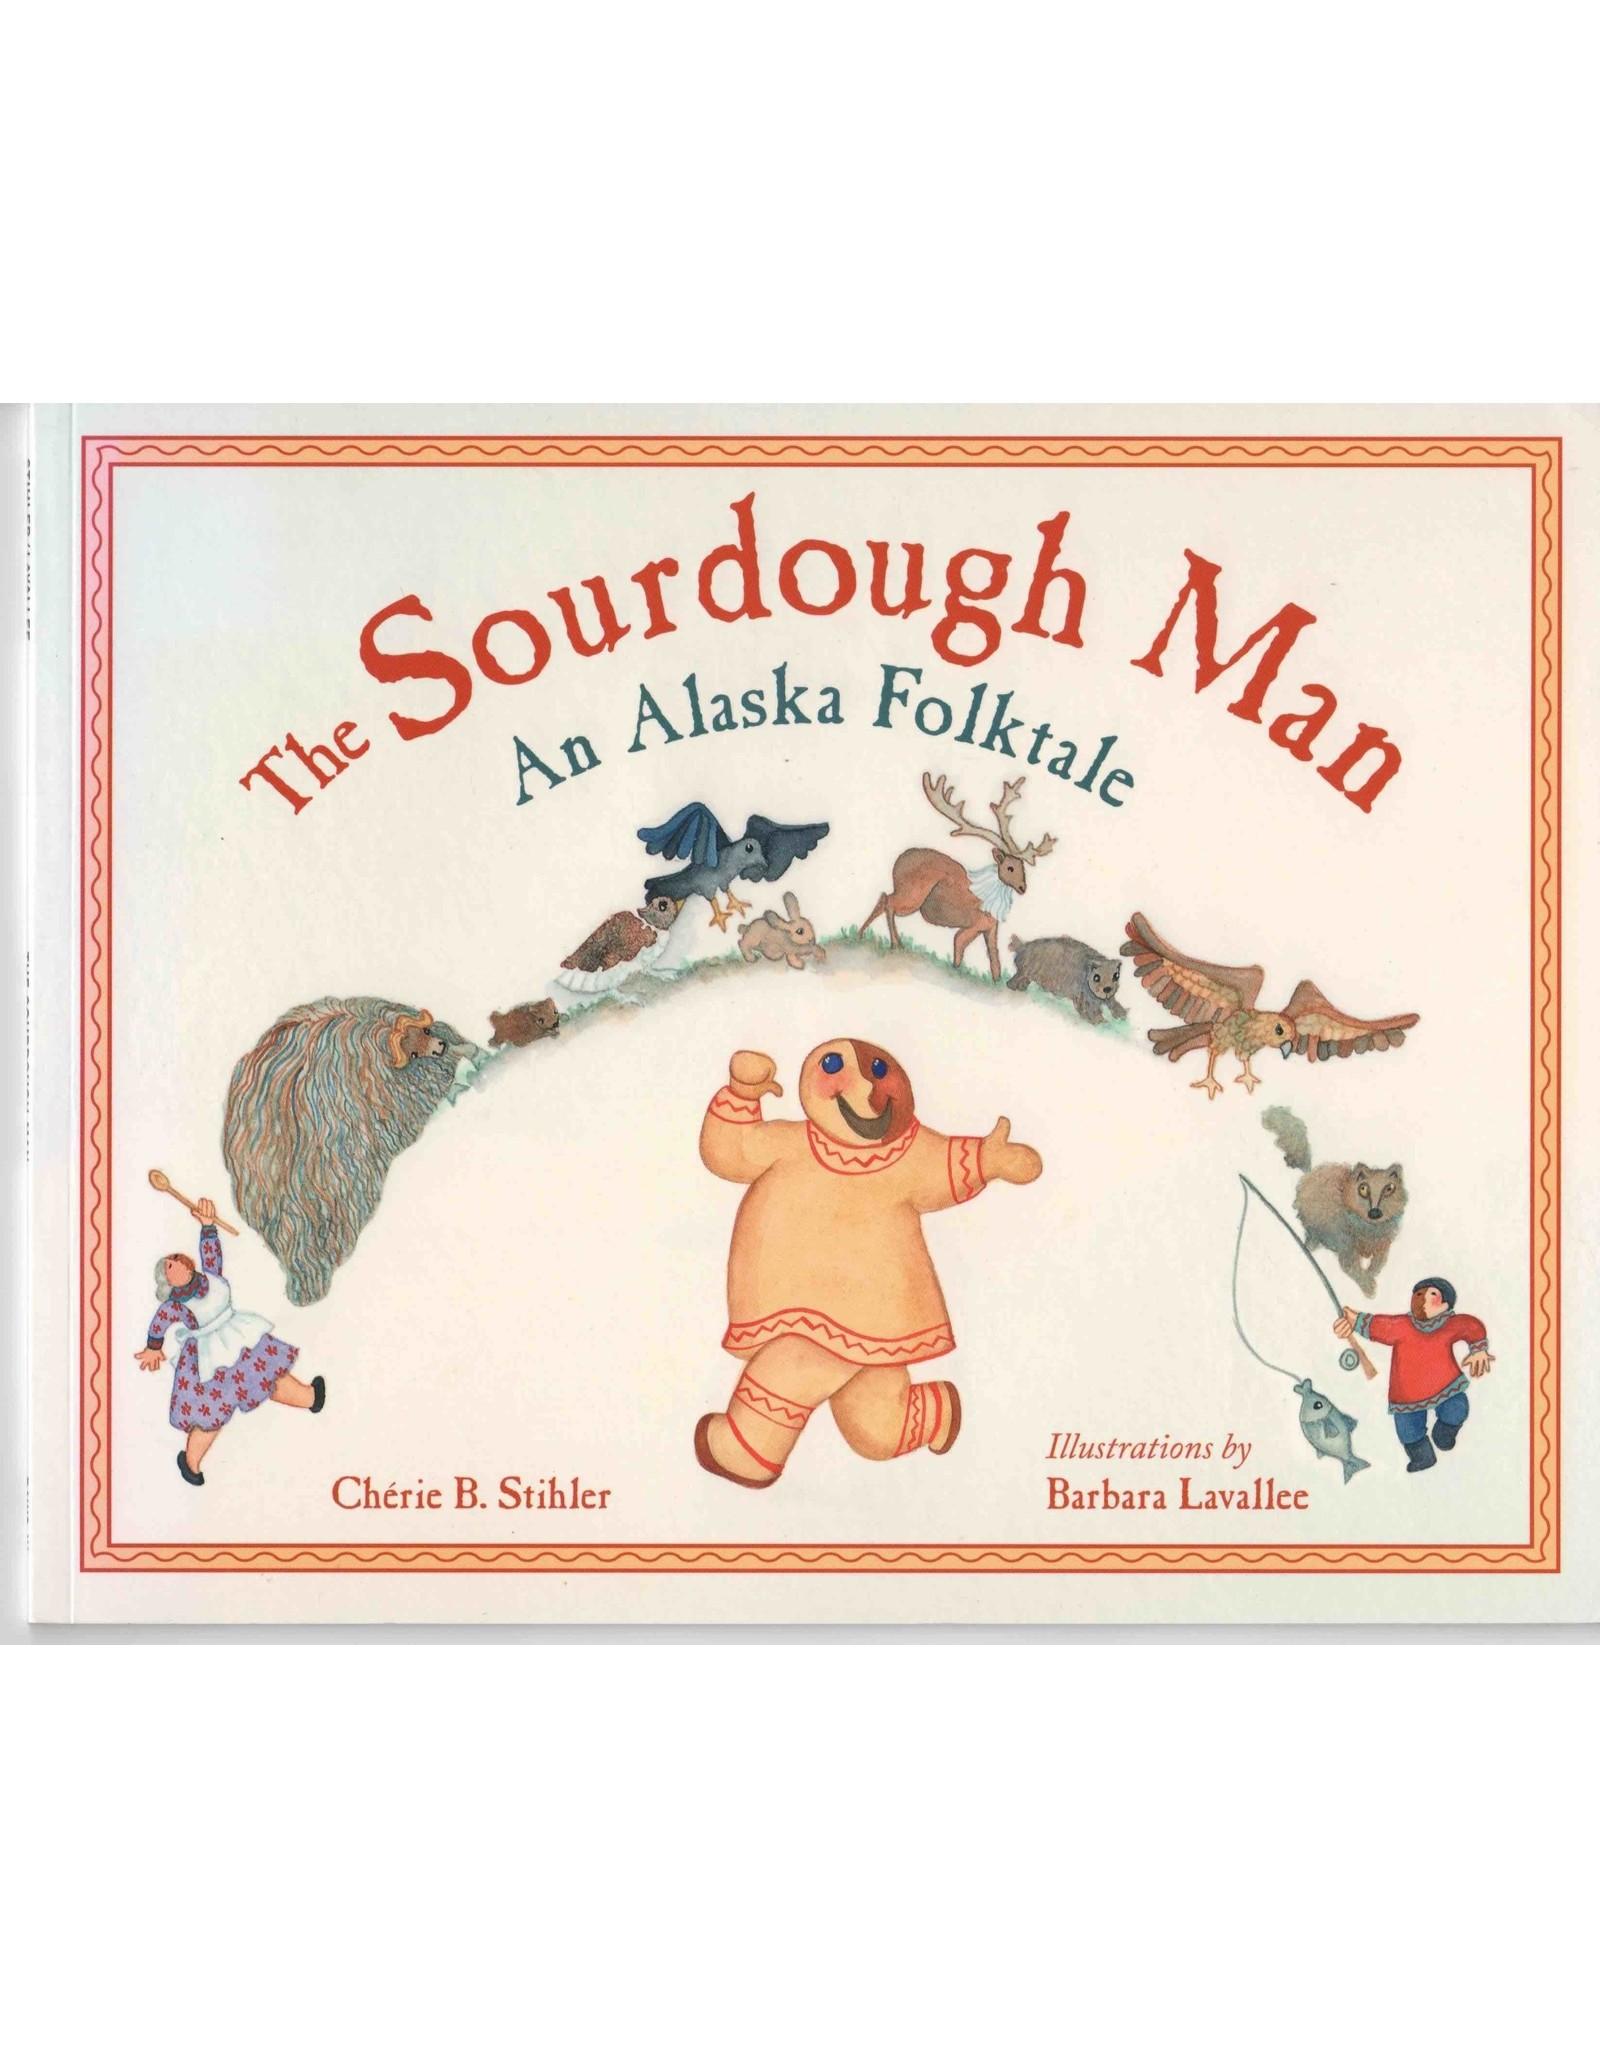 Barbara Lavallee The Sourdough Man (book) | Barbara Lavallee